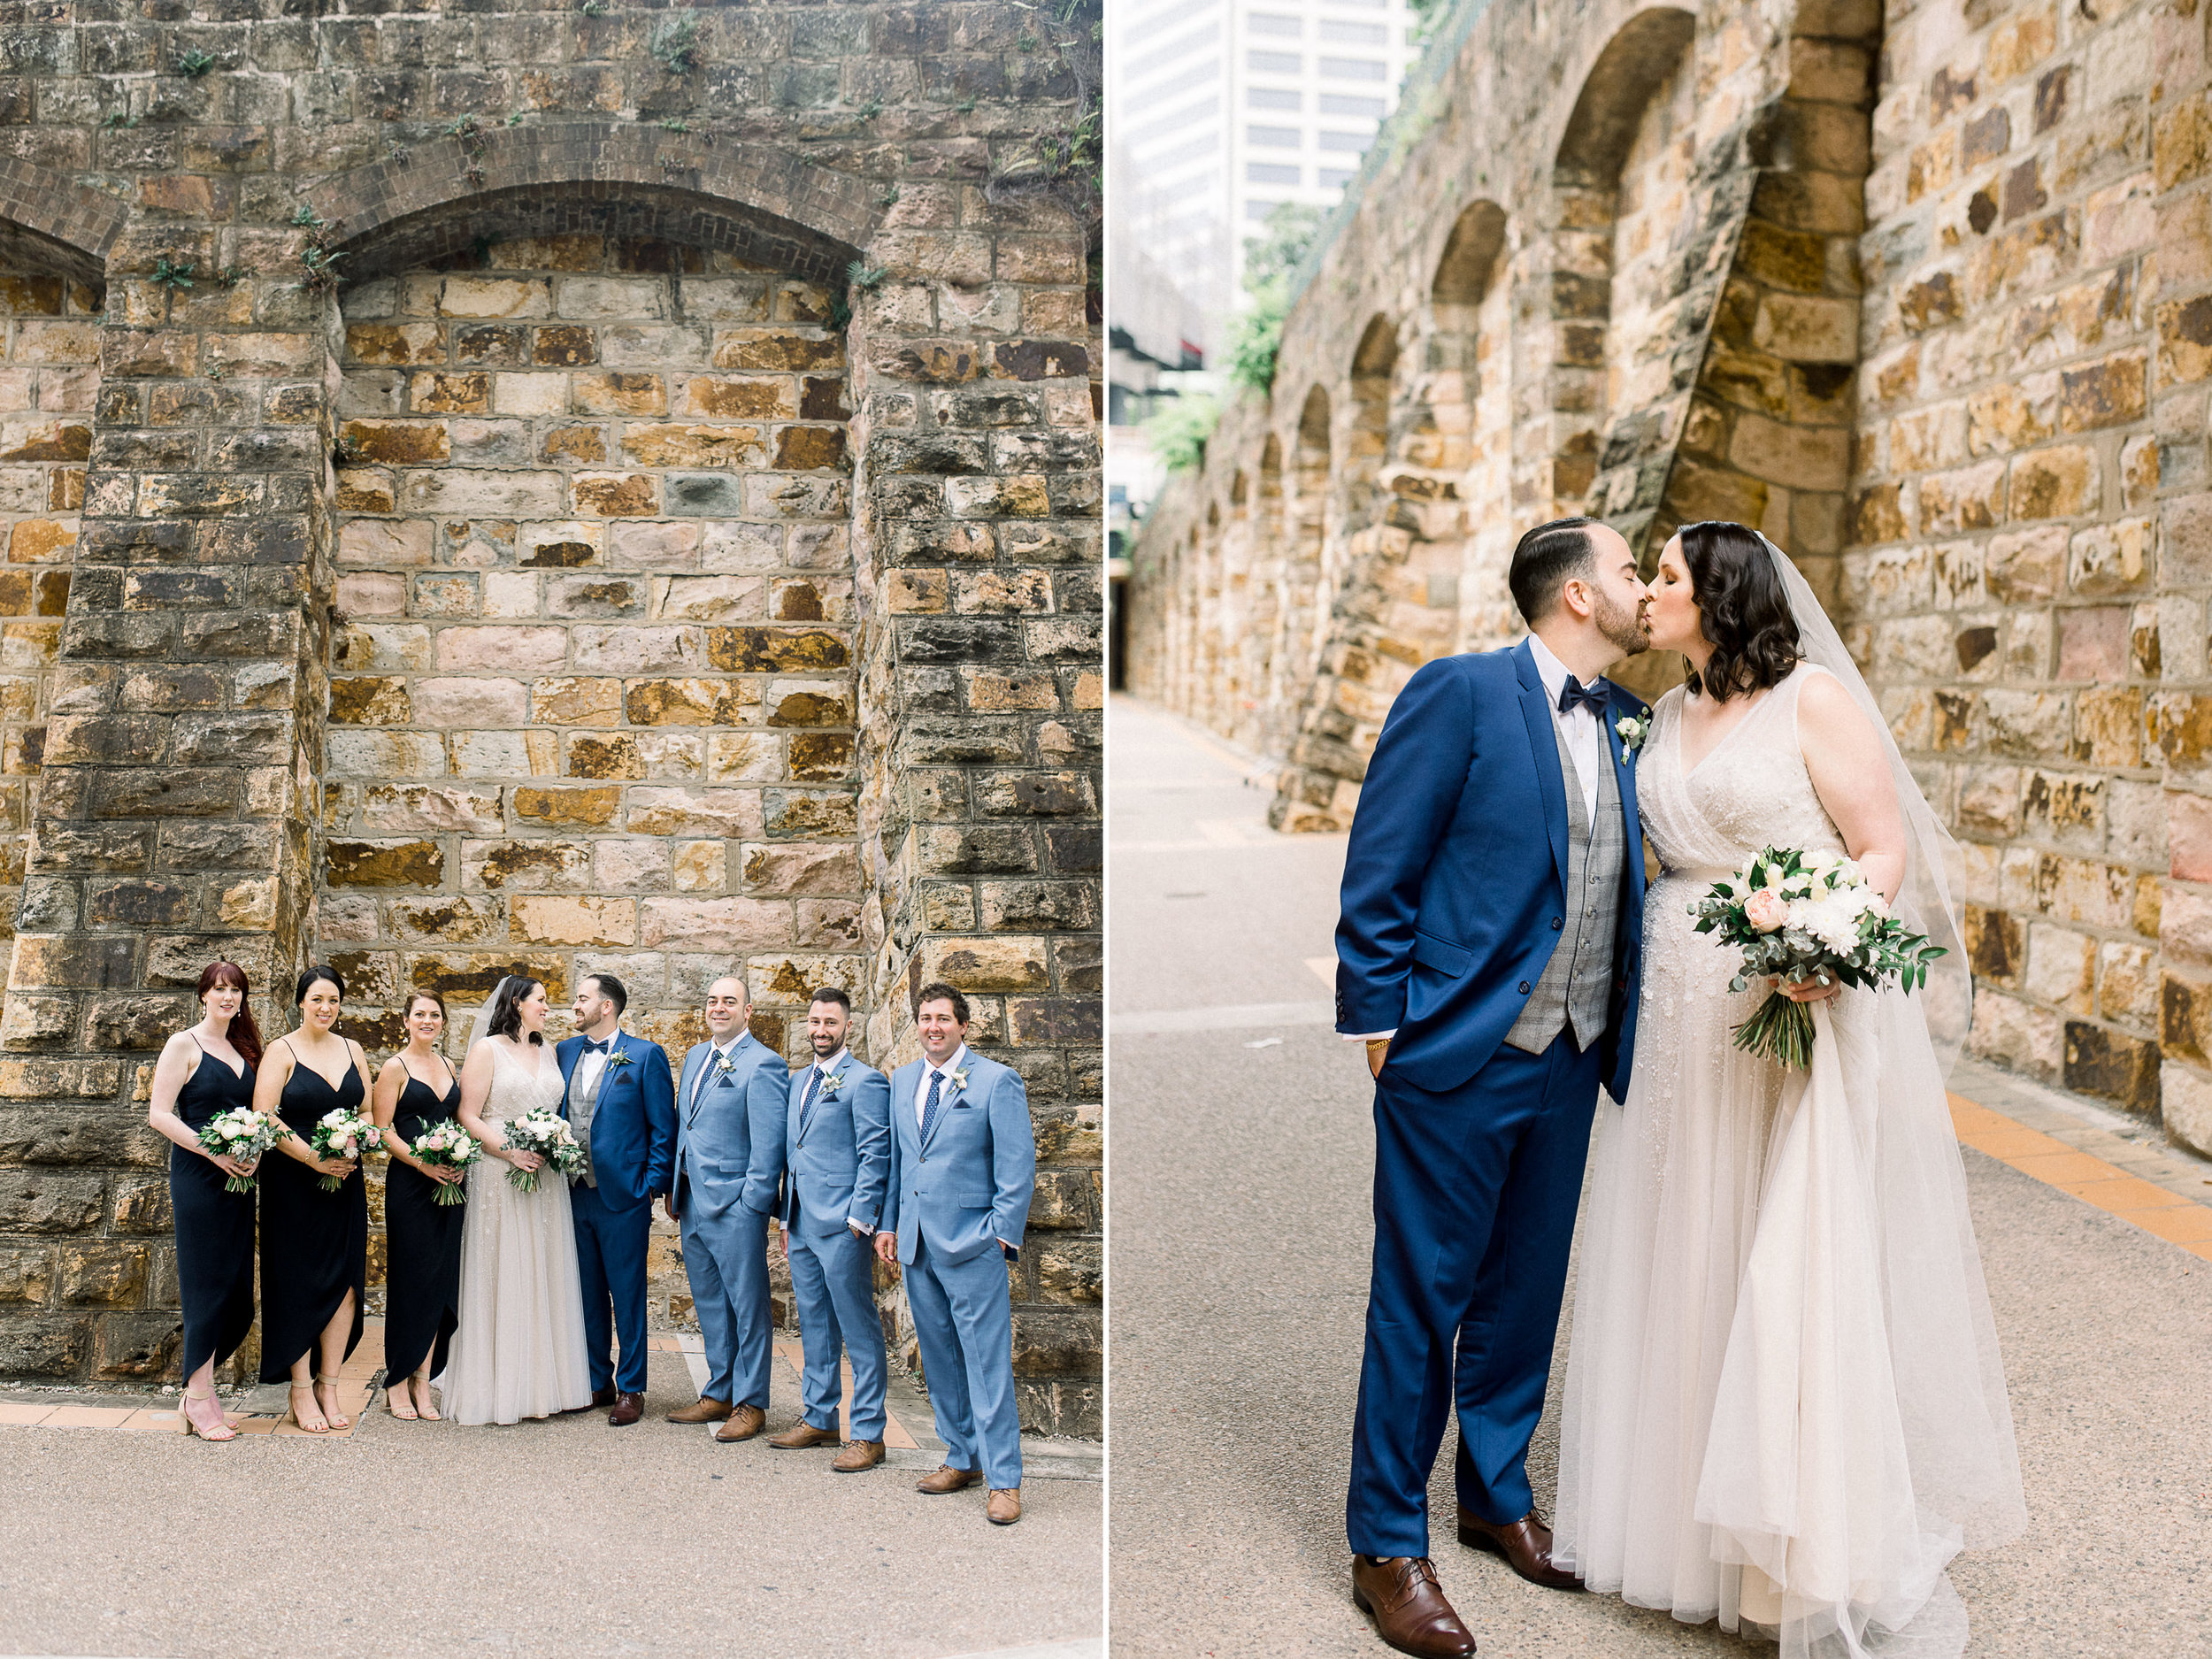 brisbane-city-wedding-romantic-bridal-photos-1.jpg